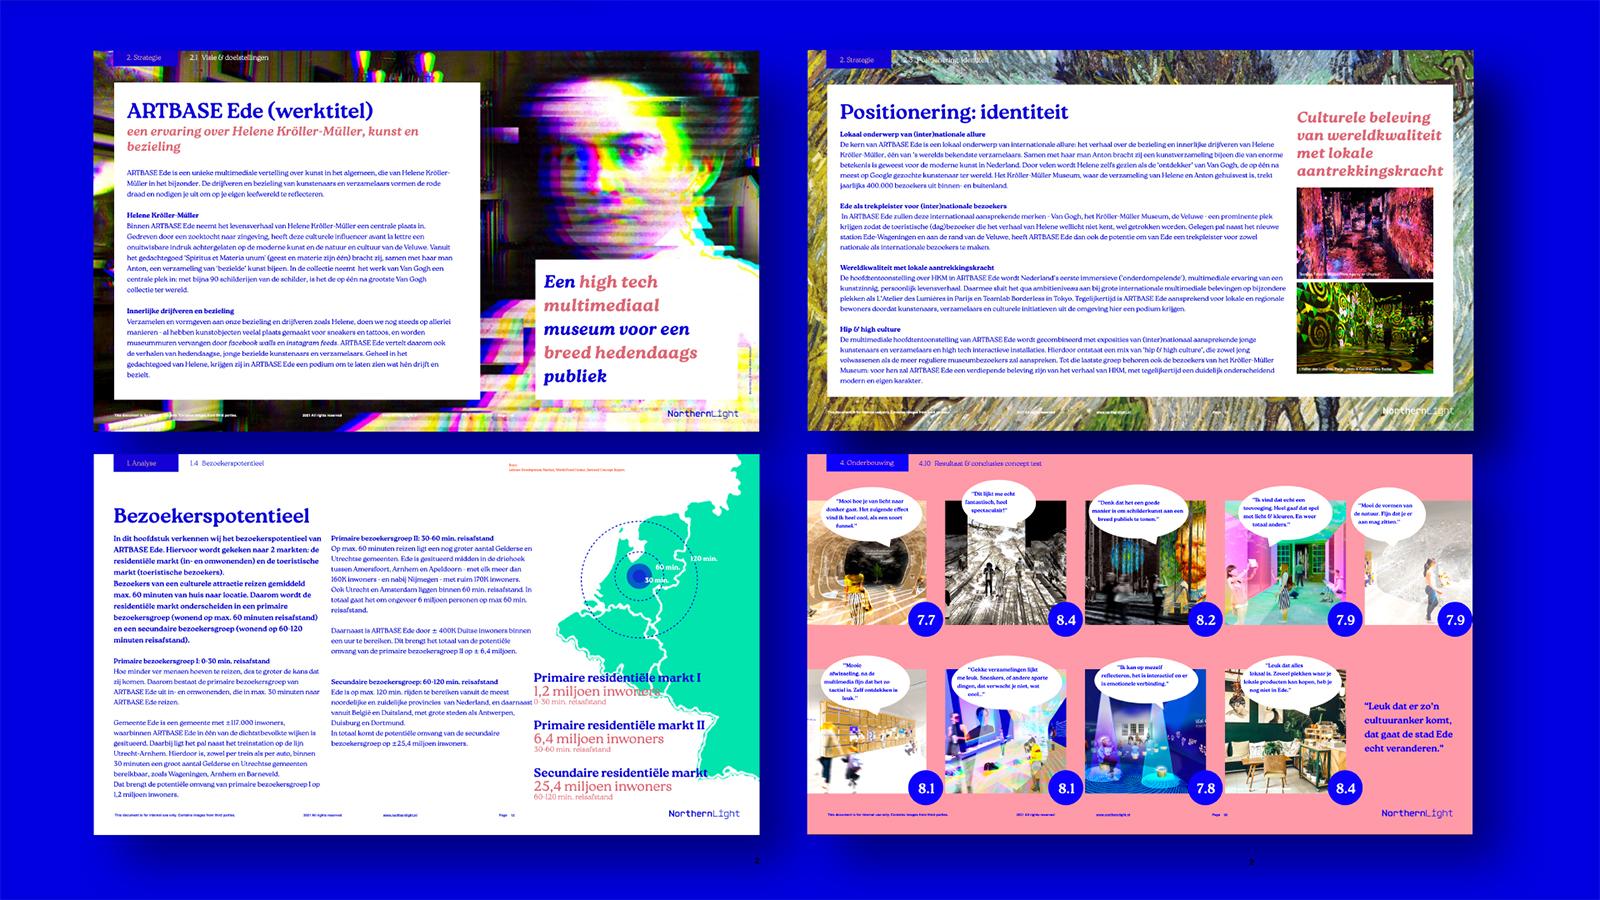 NorthernLight-ARTBASE-website-2